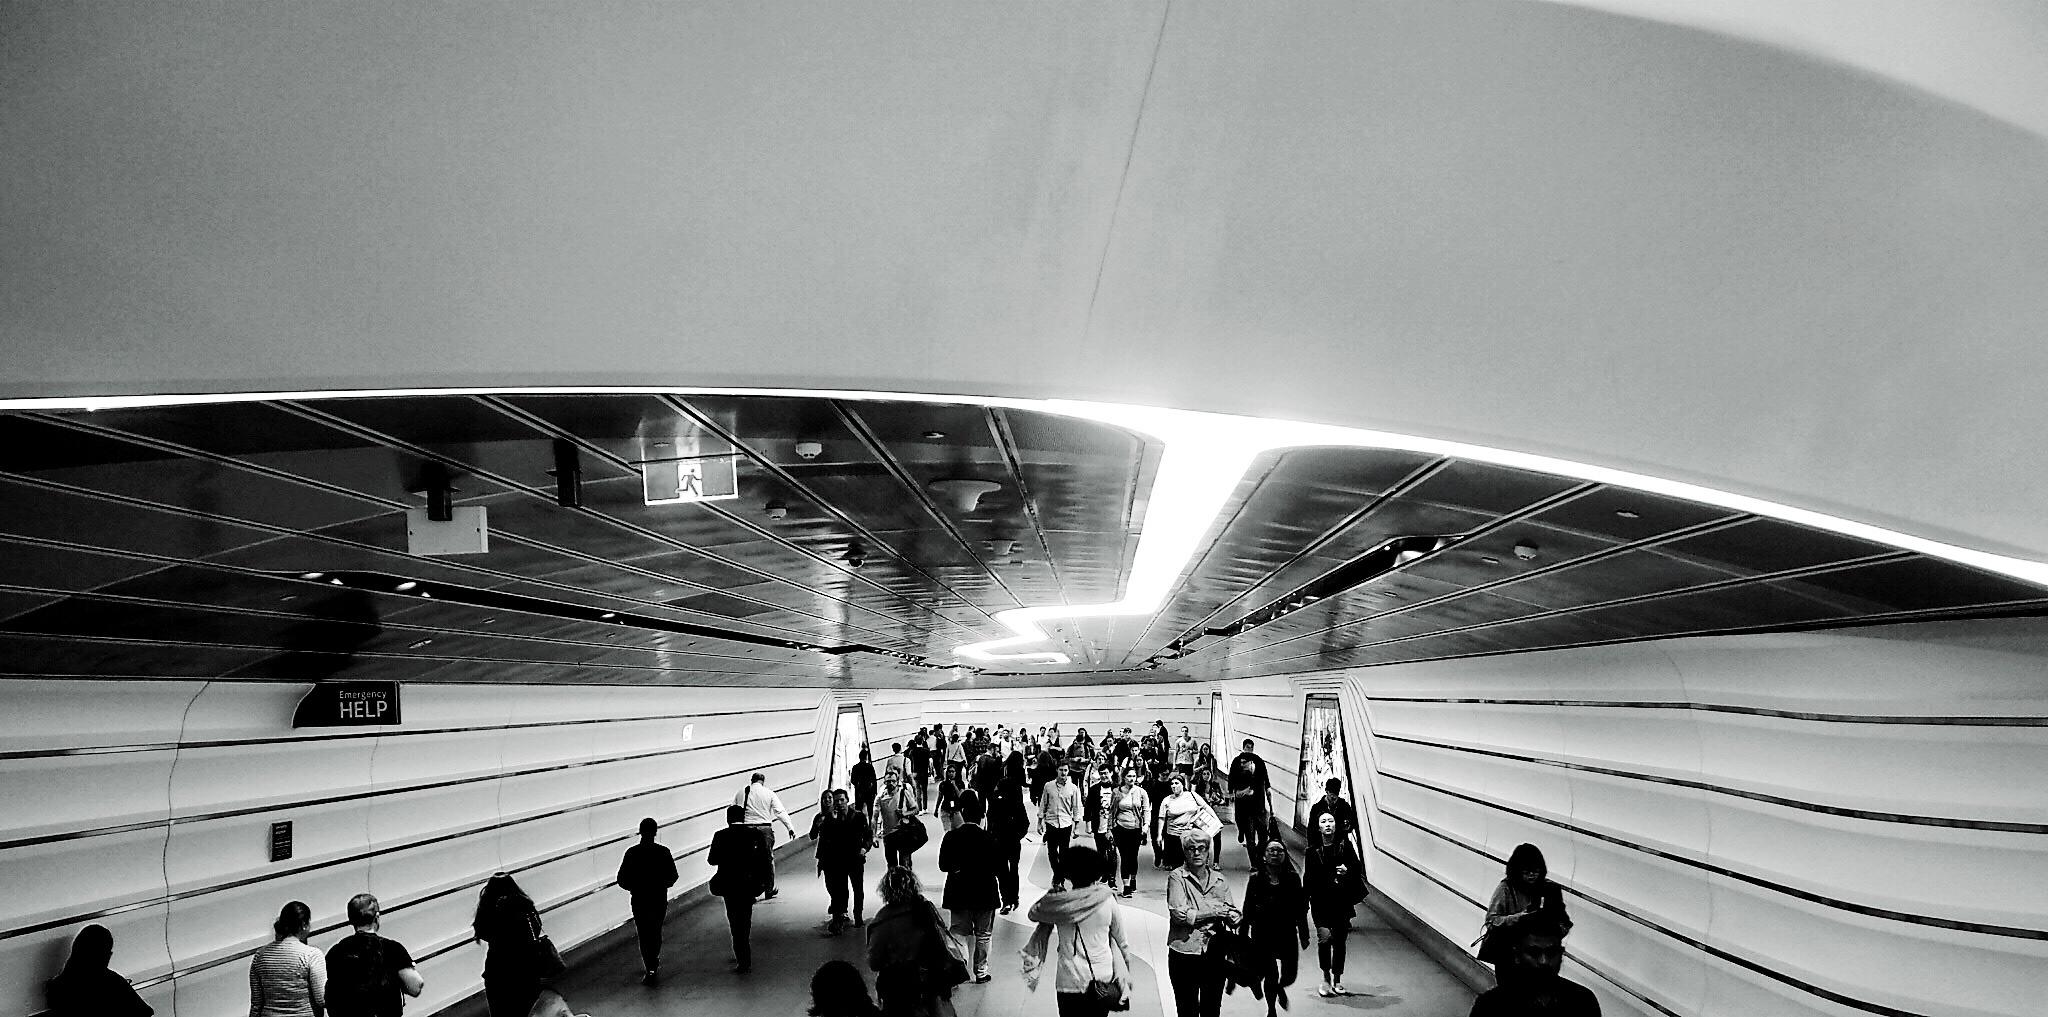 Follow The Light by djskinnylatte